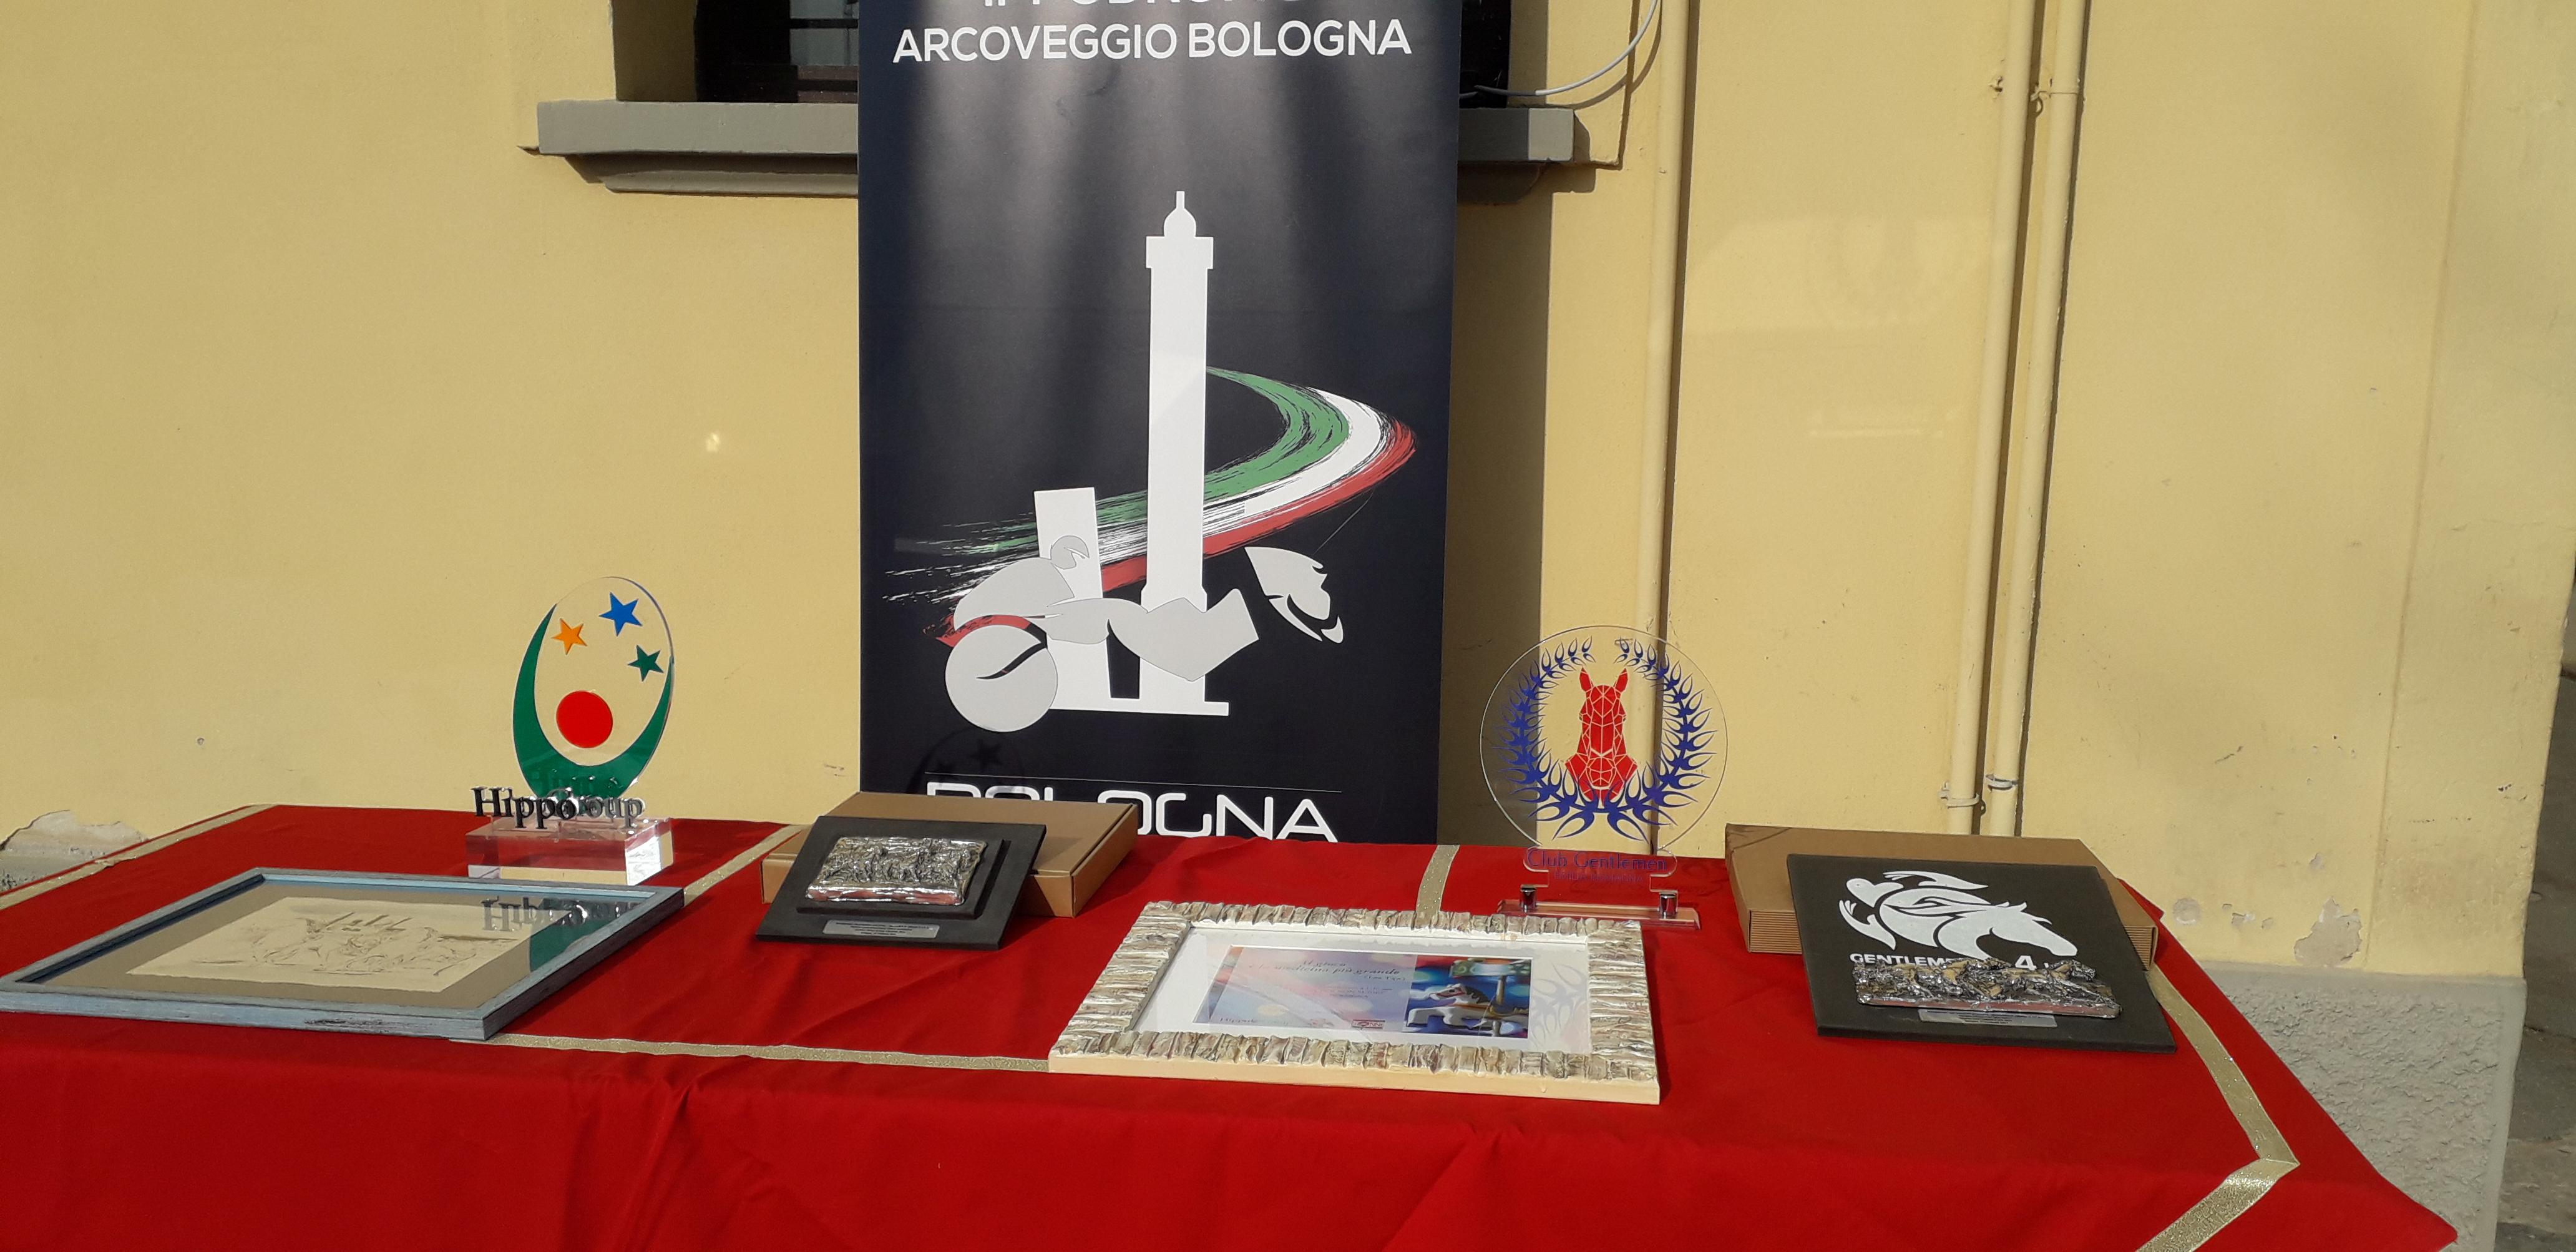 Premi Trofeo Gentlemen For Life e Trofeo Croce Rossa Italiana